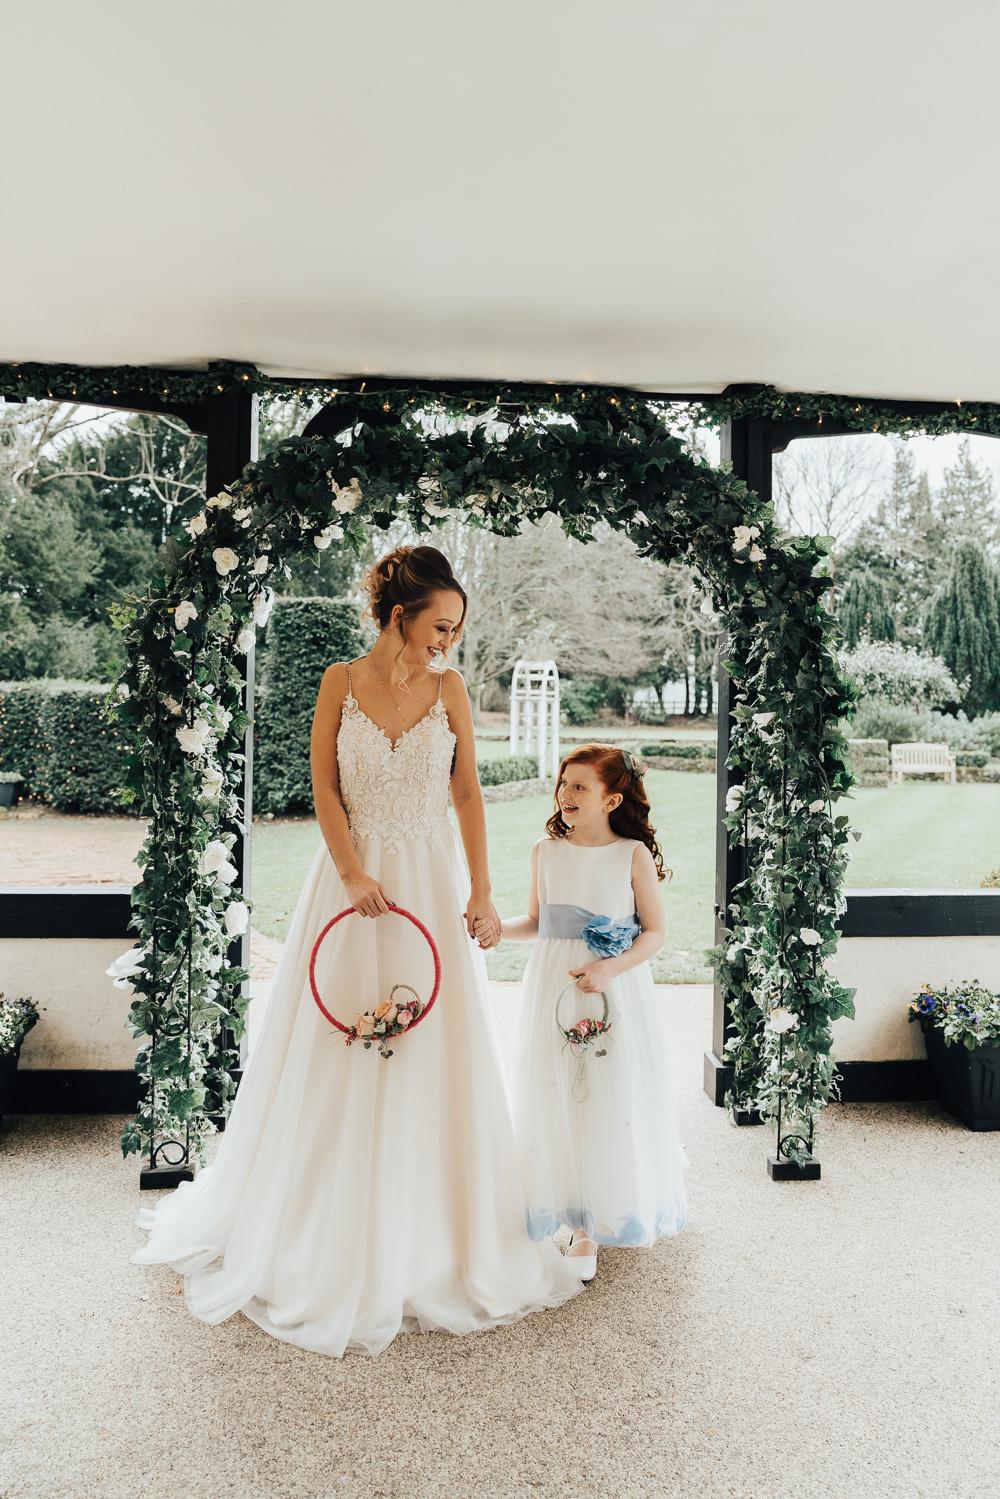 Greenery Foliage Arch Flower Backdrop Hoop Wedding Ideas Rebecca Carpenter Photography